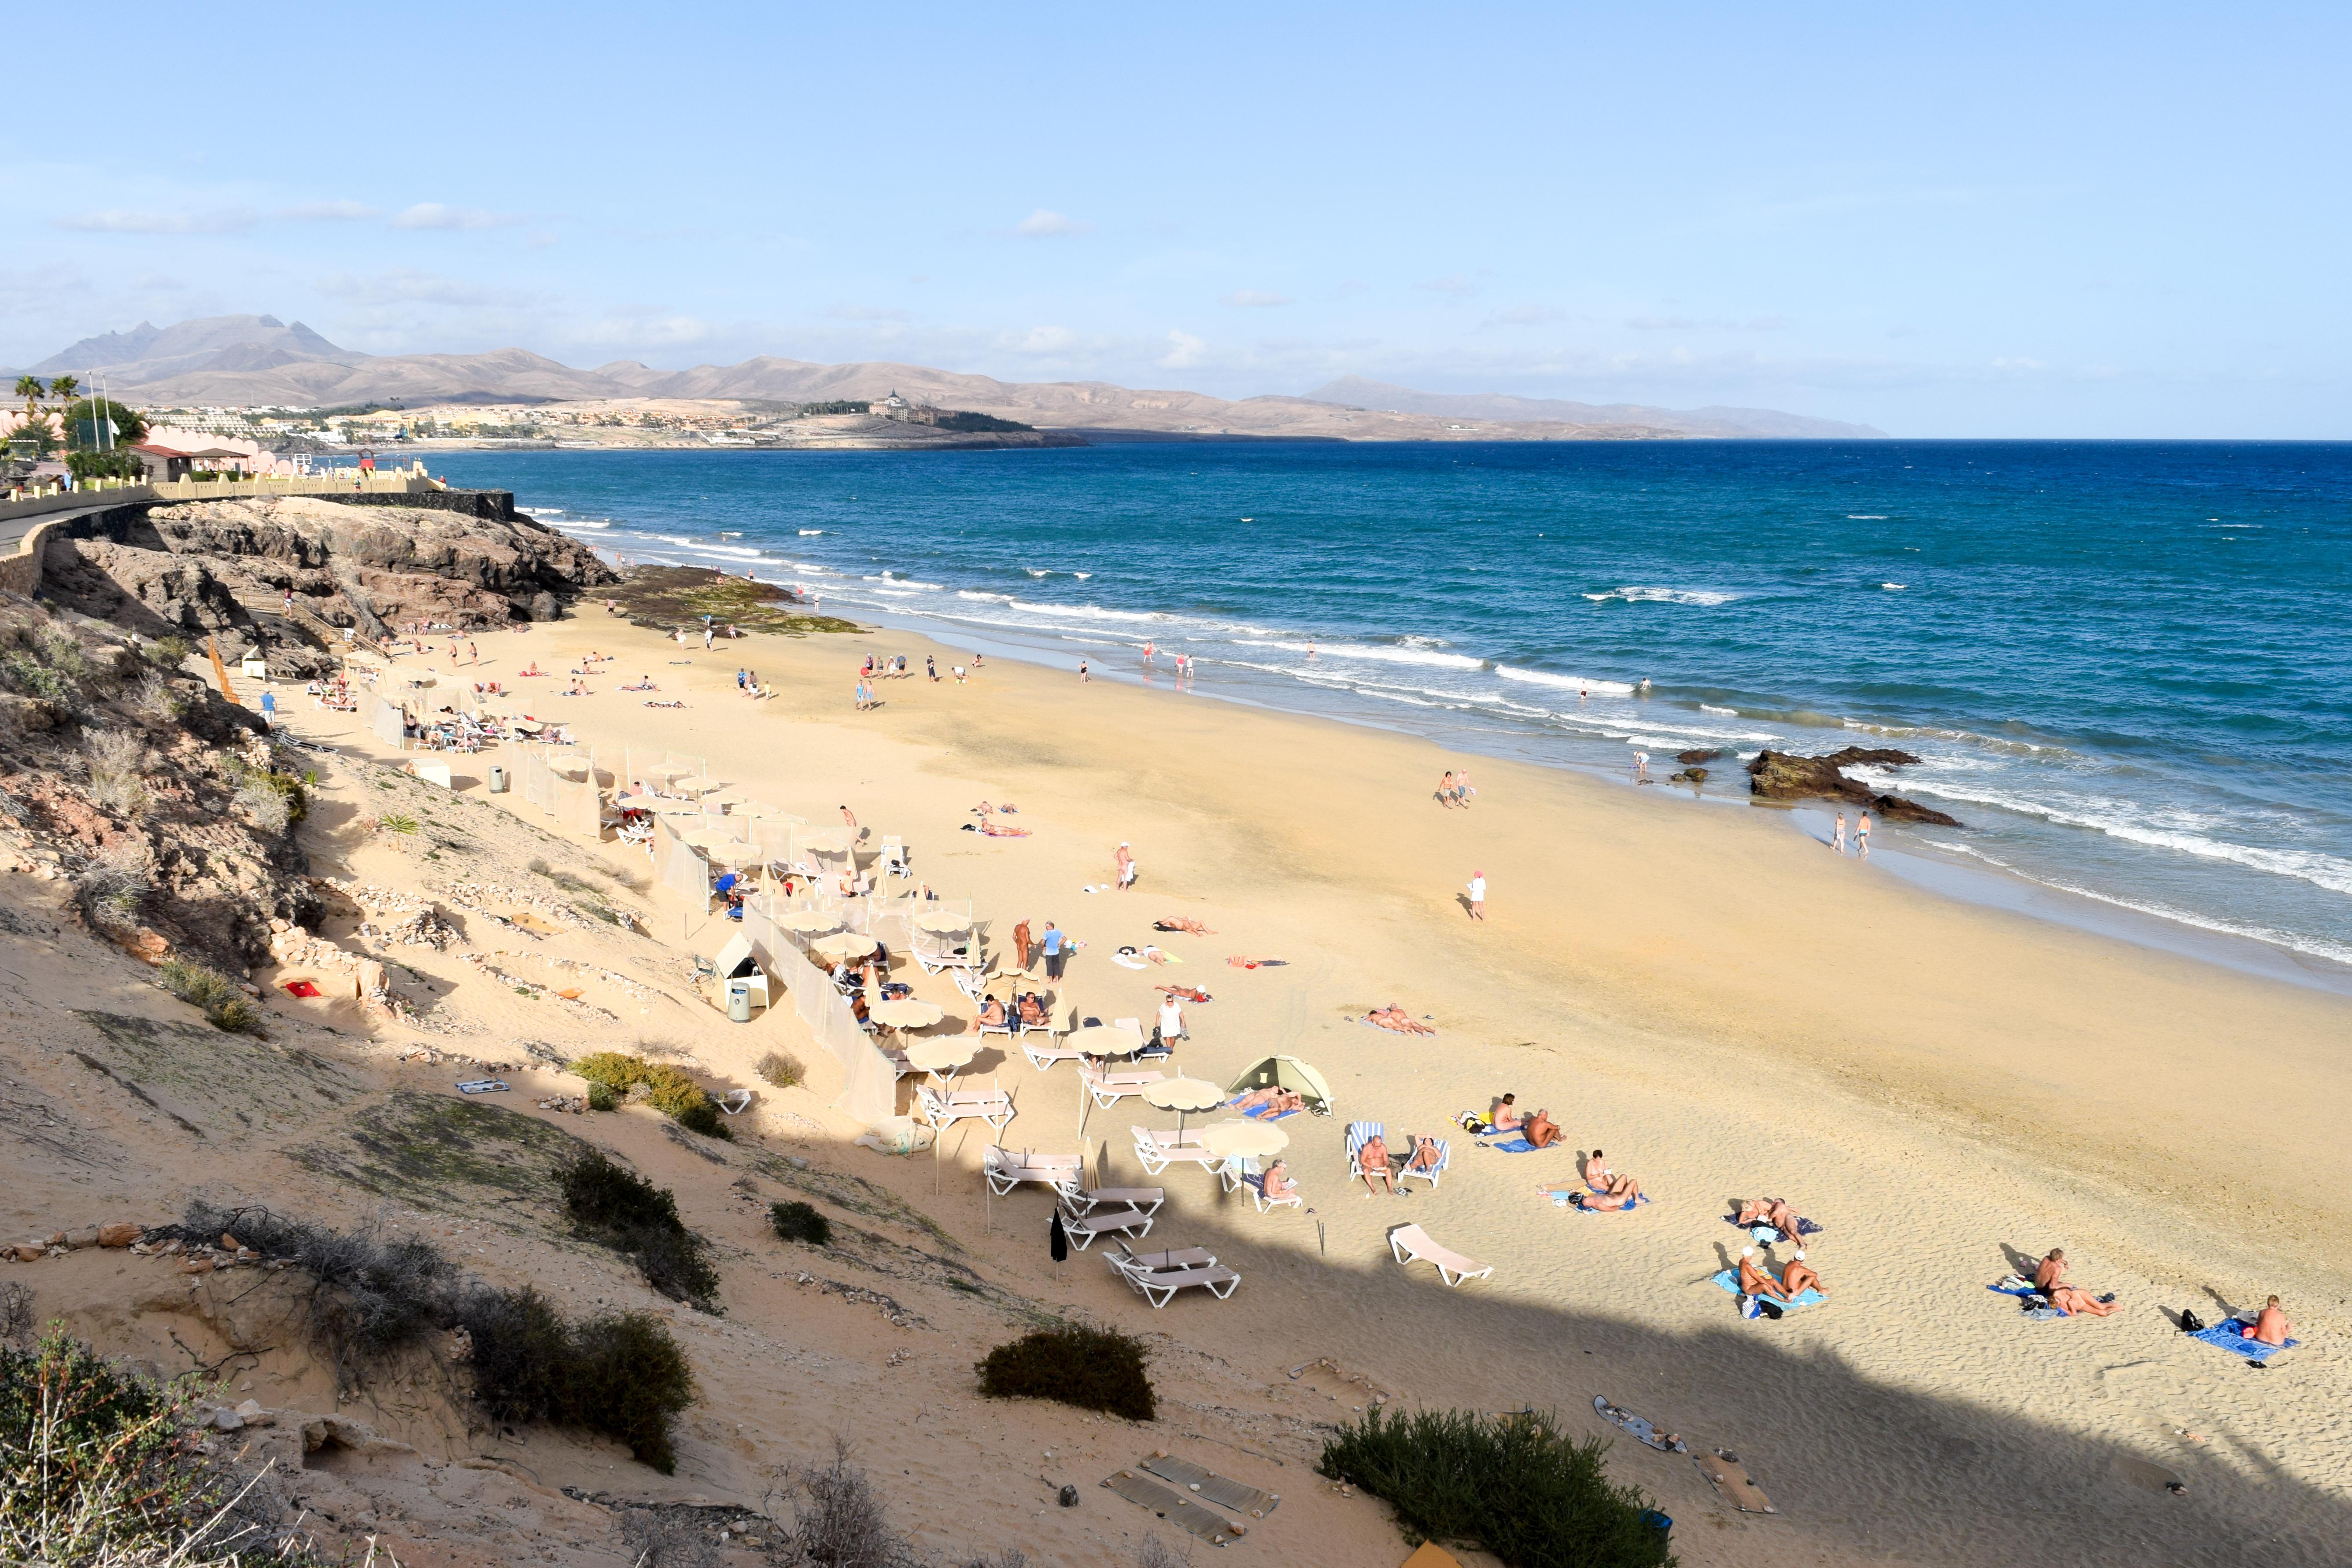 Playa de Costa Calma South Fuerteventura Pictures videos insider tips